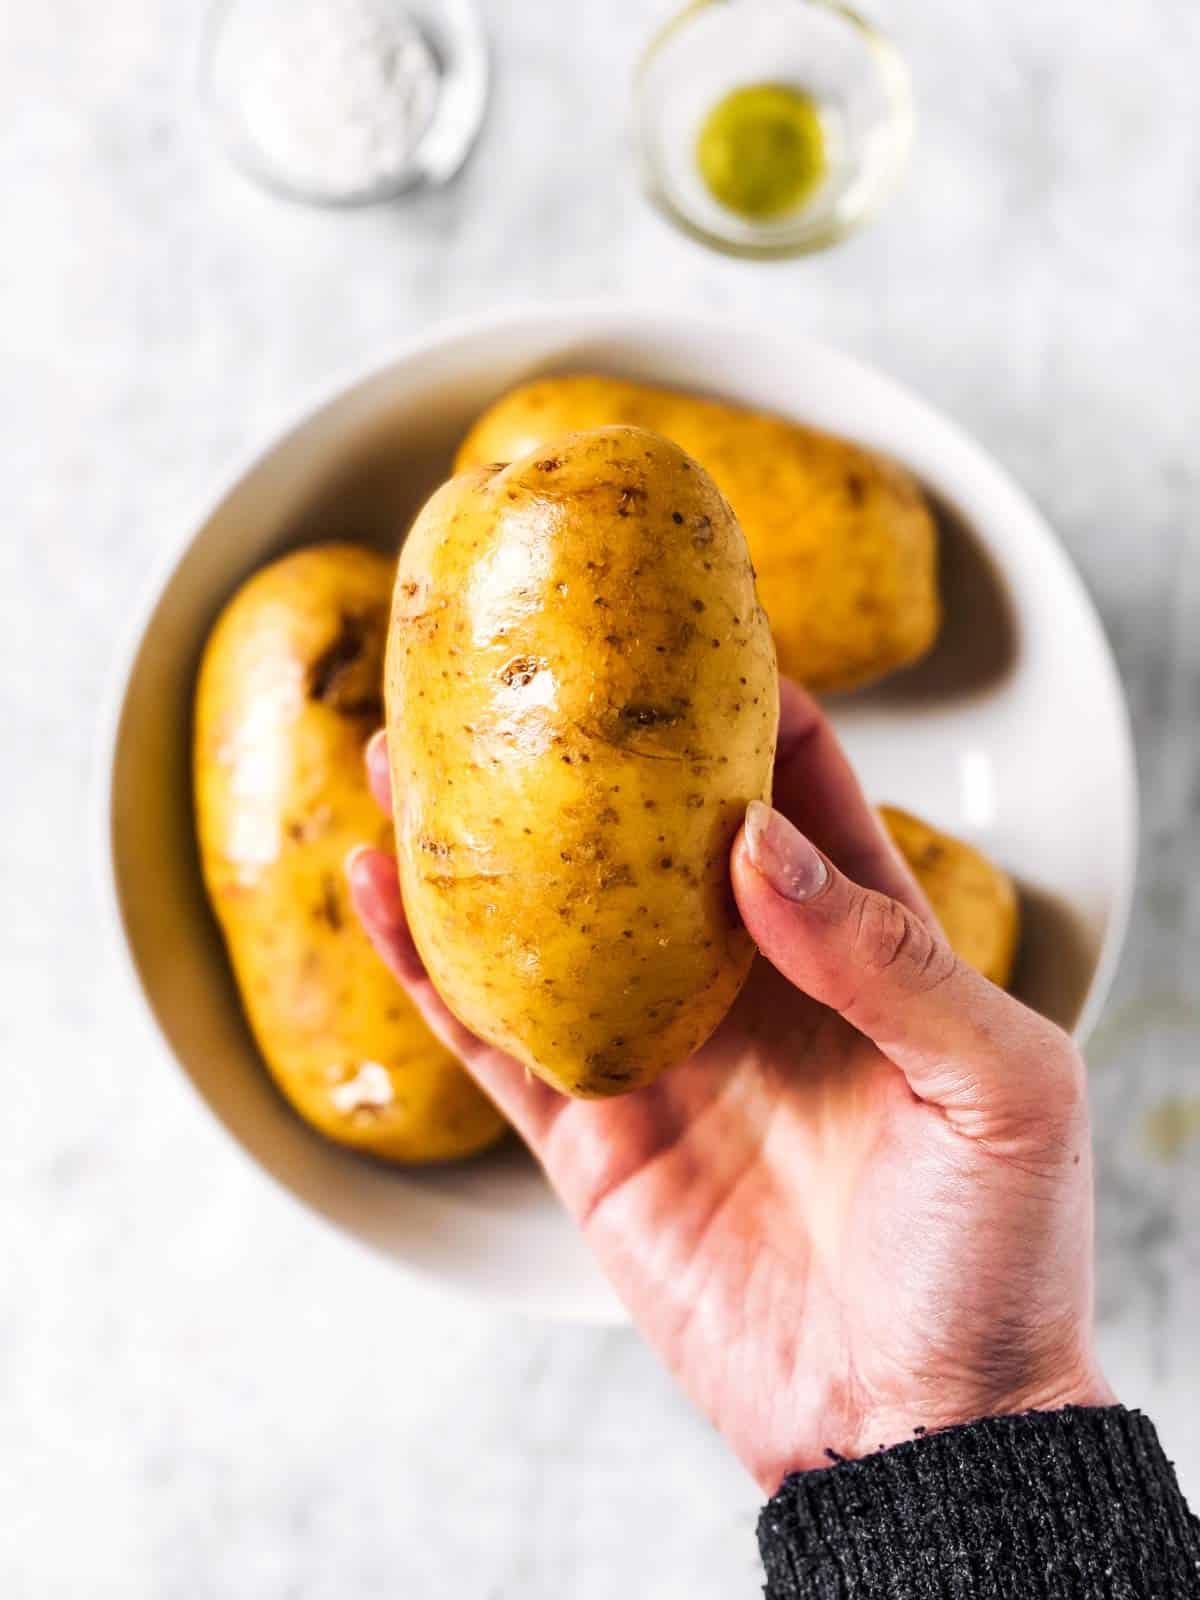 female hand holding an oil russet potato